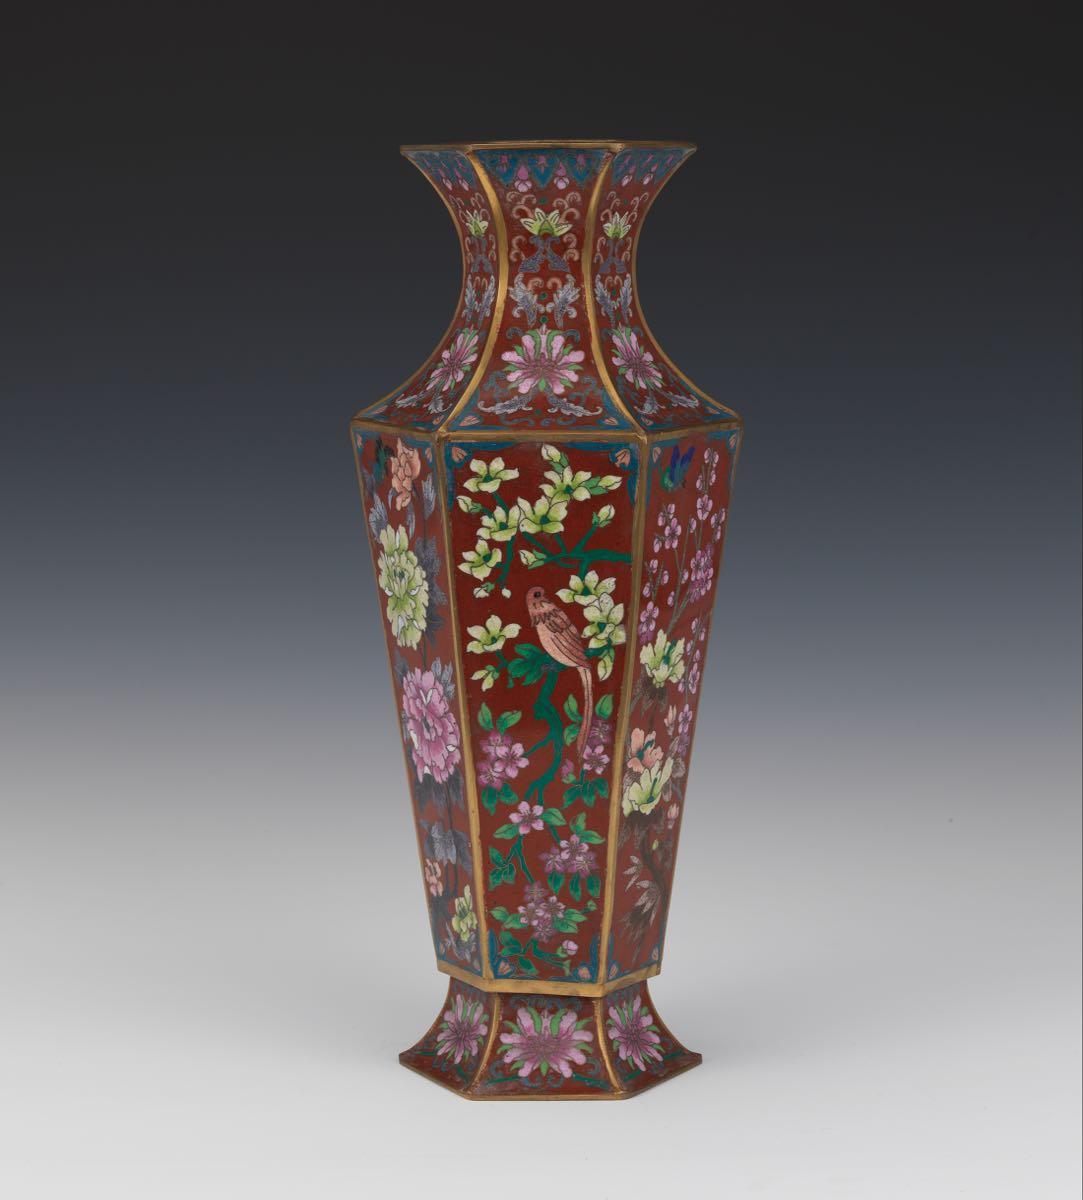 Hexagonal Cloisonne Vase 021915 Sold 1955